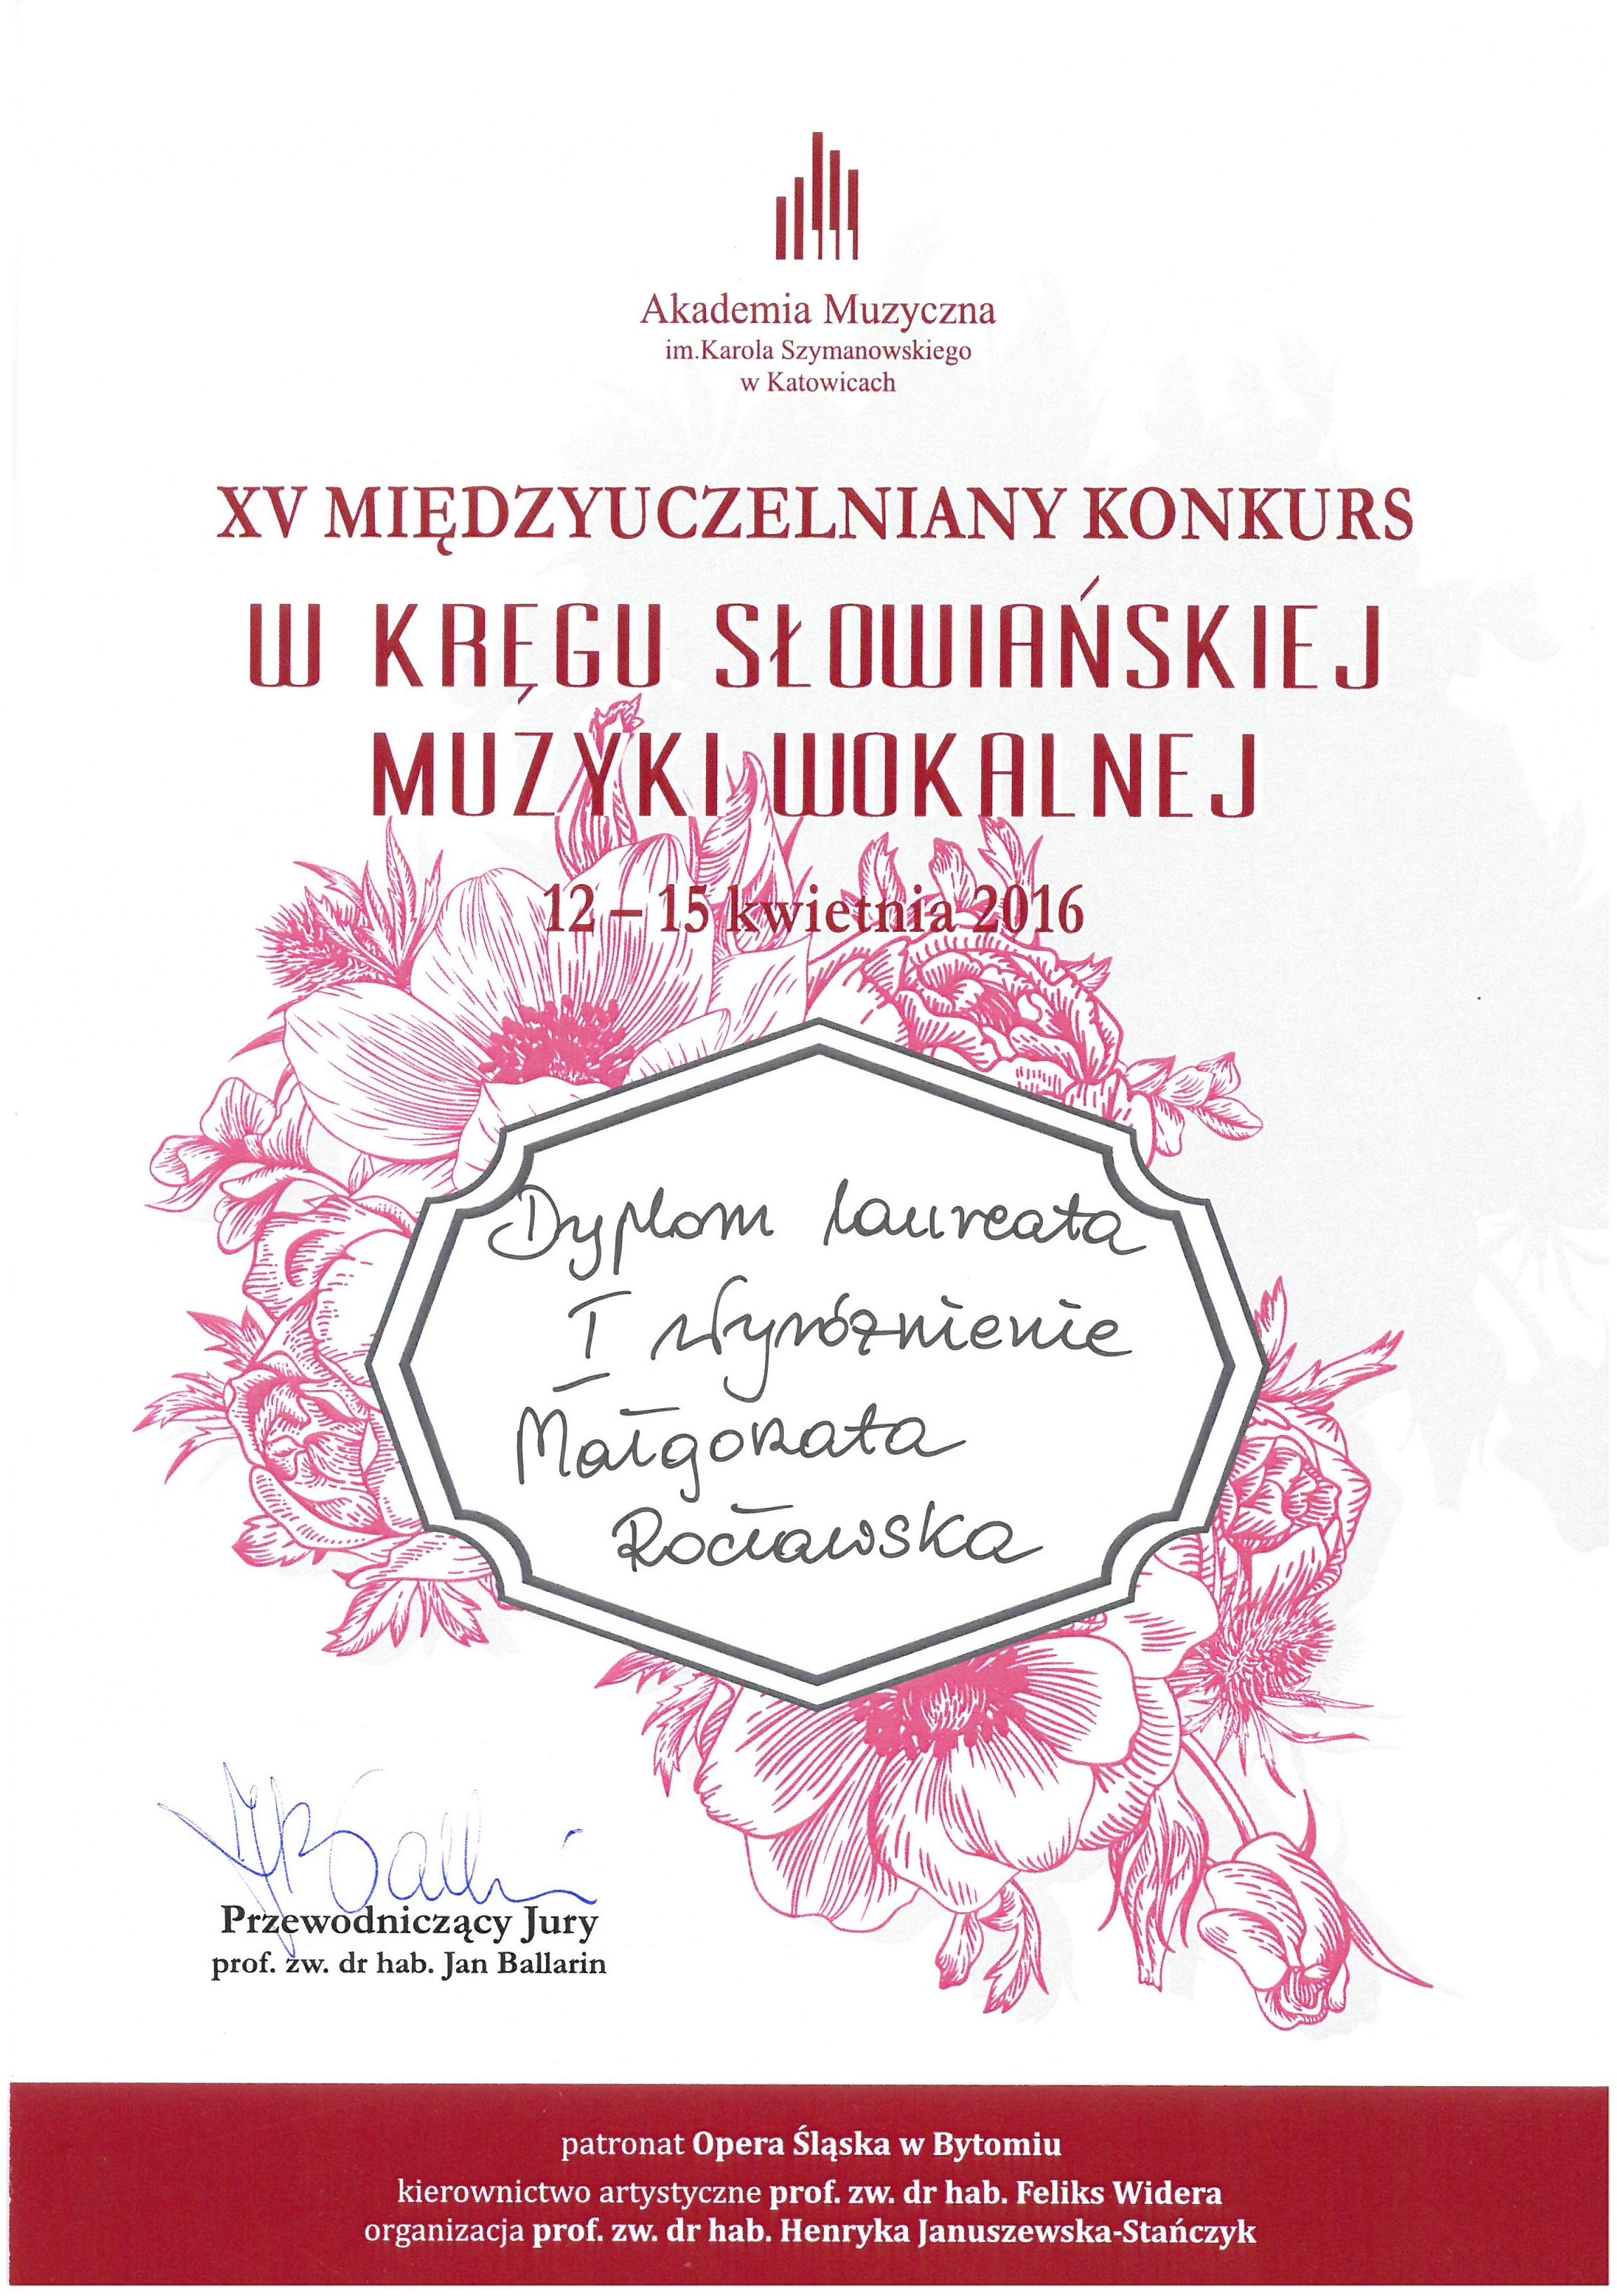 Malgorzata_Roclawska_dyplom1_awers